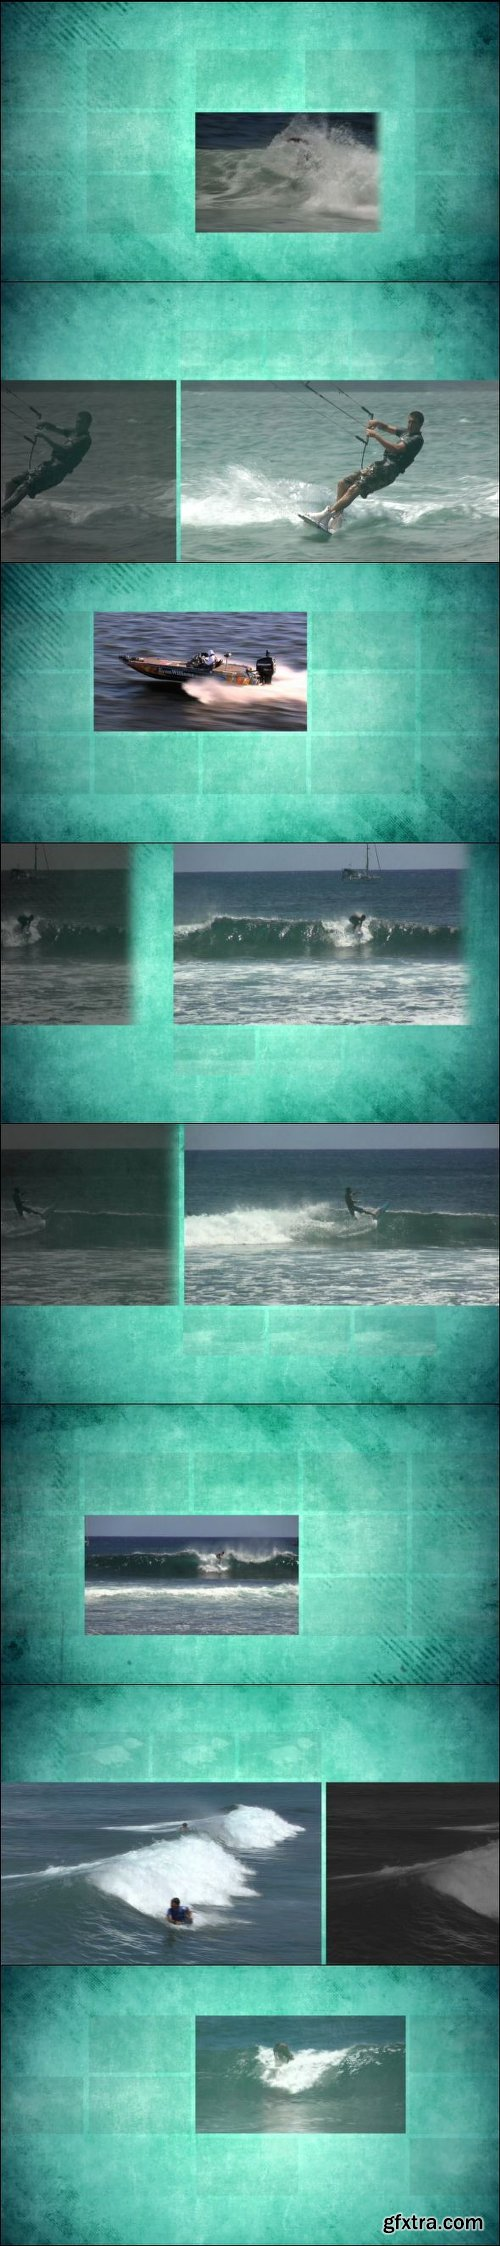 Aqua Sports Motion Apple Motion